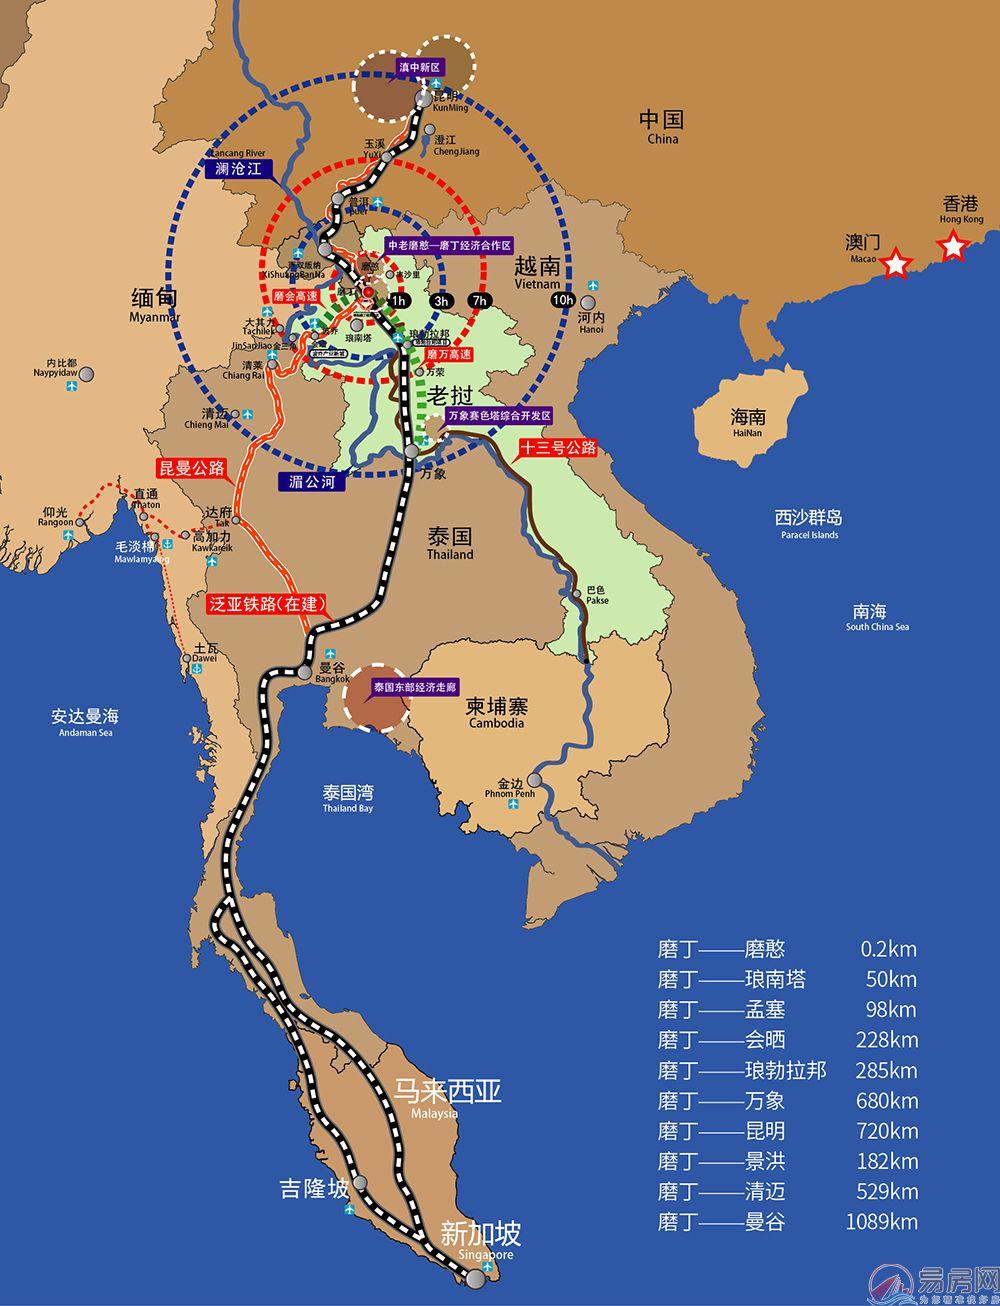 http://yuefangwangimg.oss-cn-hangzhou.aliyuncs.com/uploads/20190703/87fc3cdc2e15dee856e76738a2fc016cMax.jpg